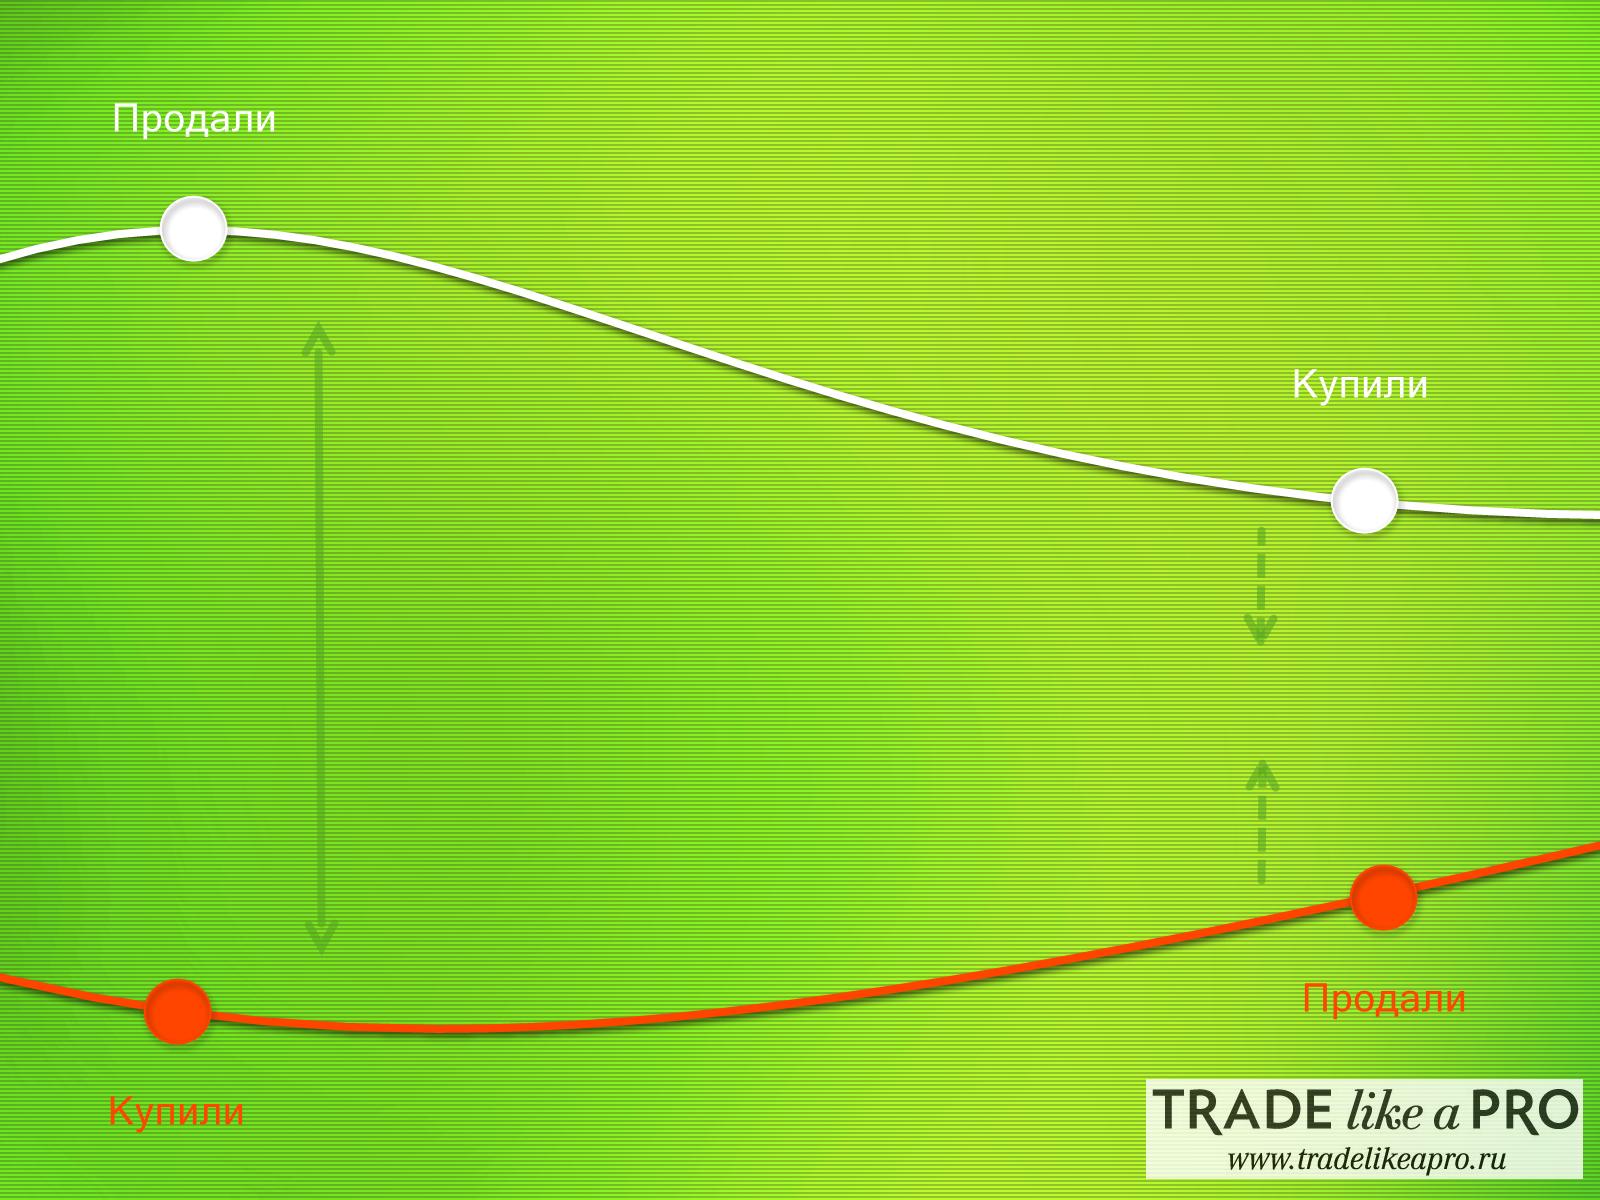 Арбитражная торговля на форекс торговля онлайн форекс